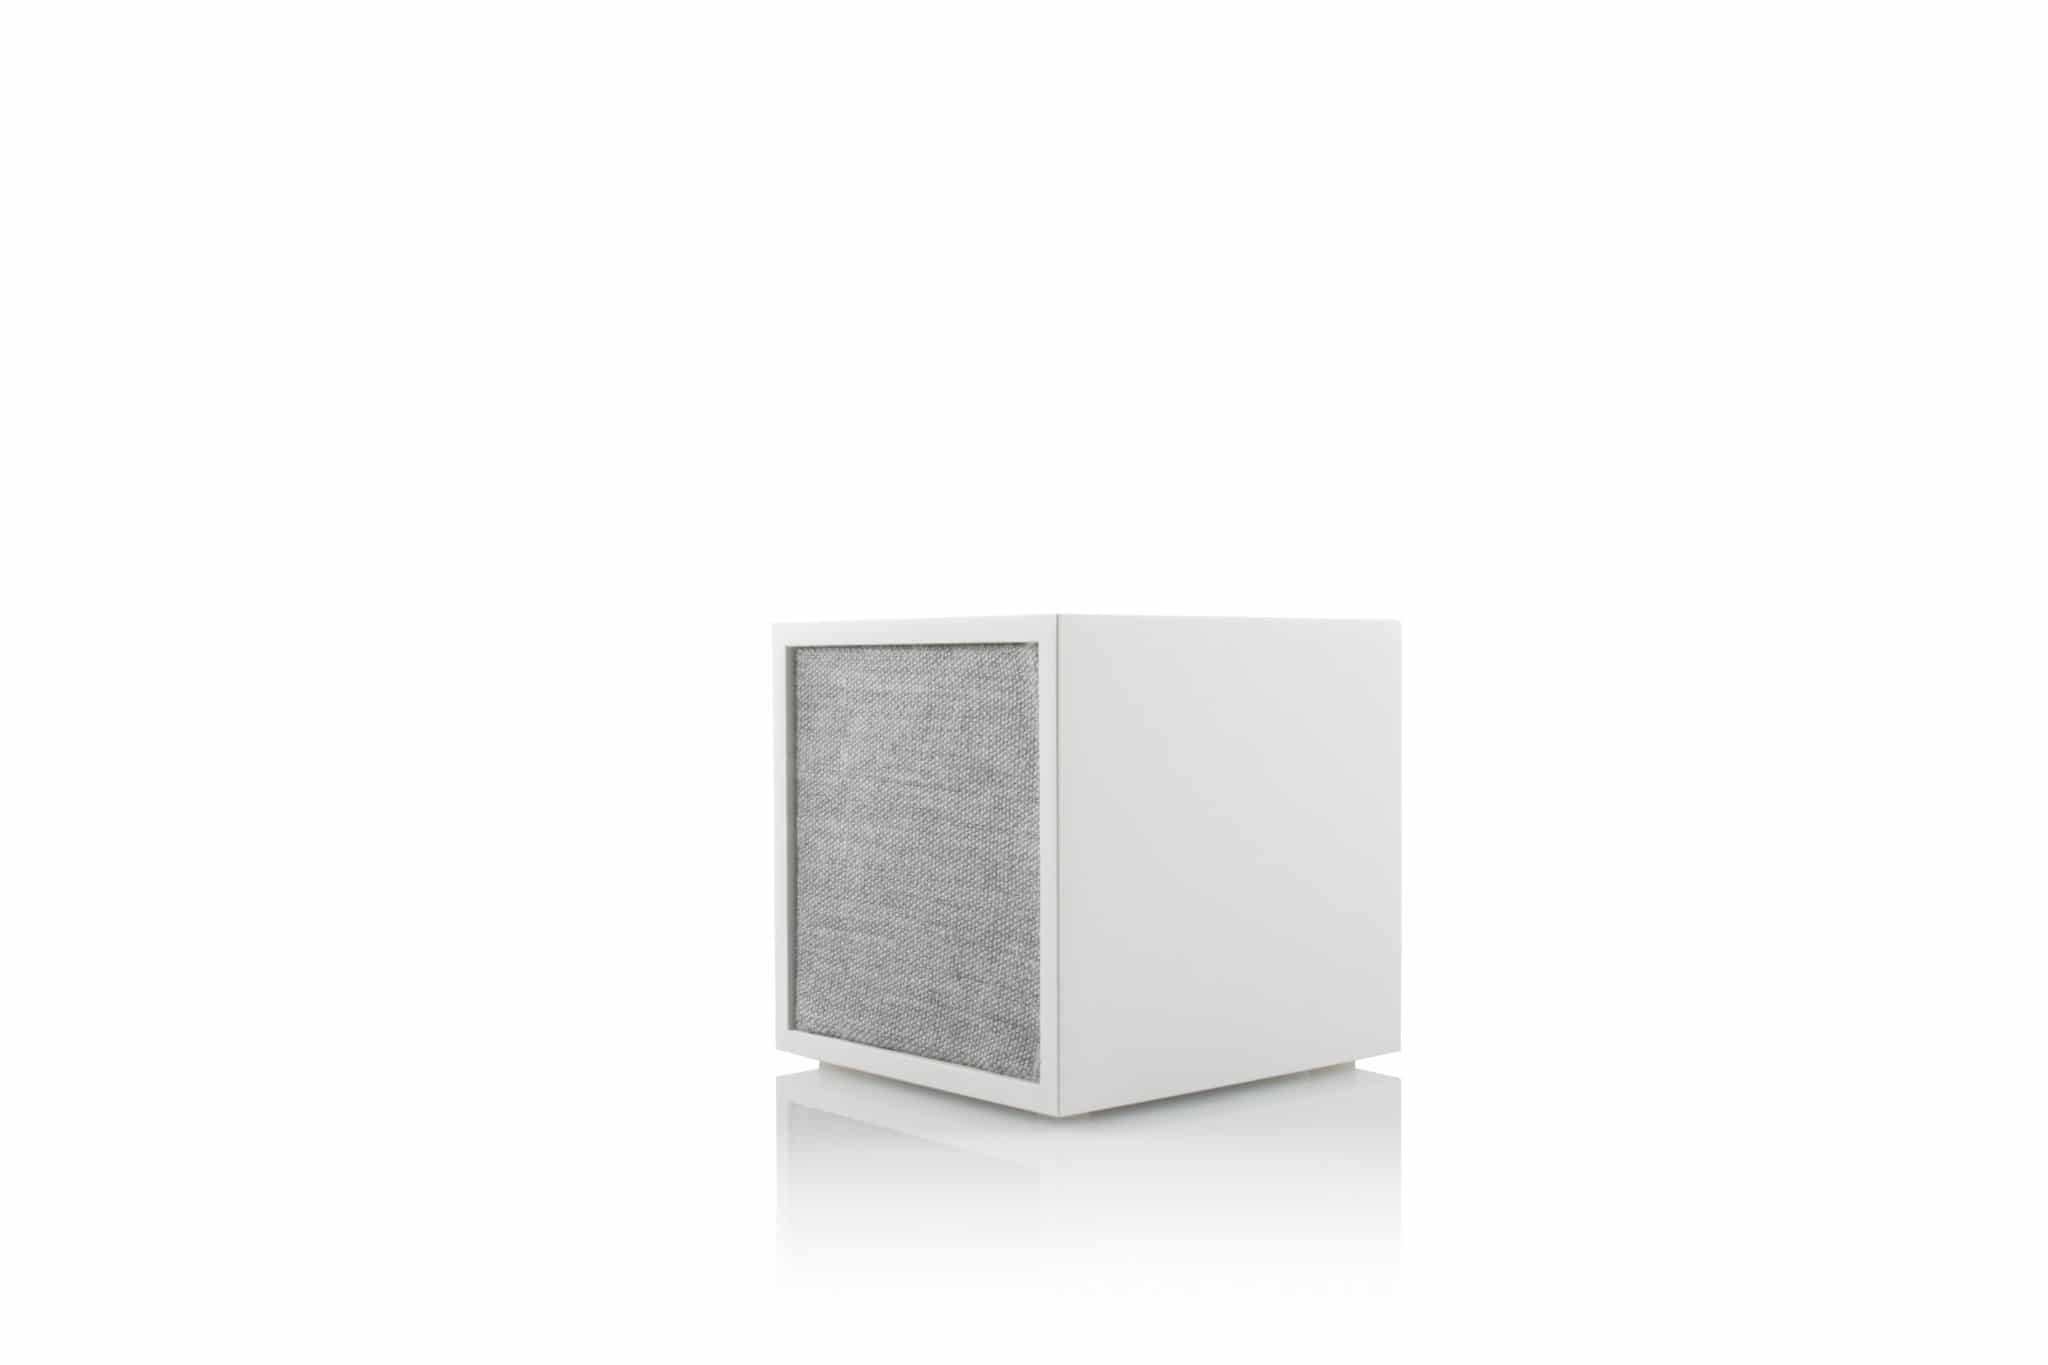 tivoli-art-cube_white_rgb_32709032954_o